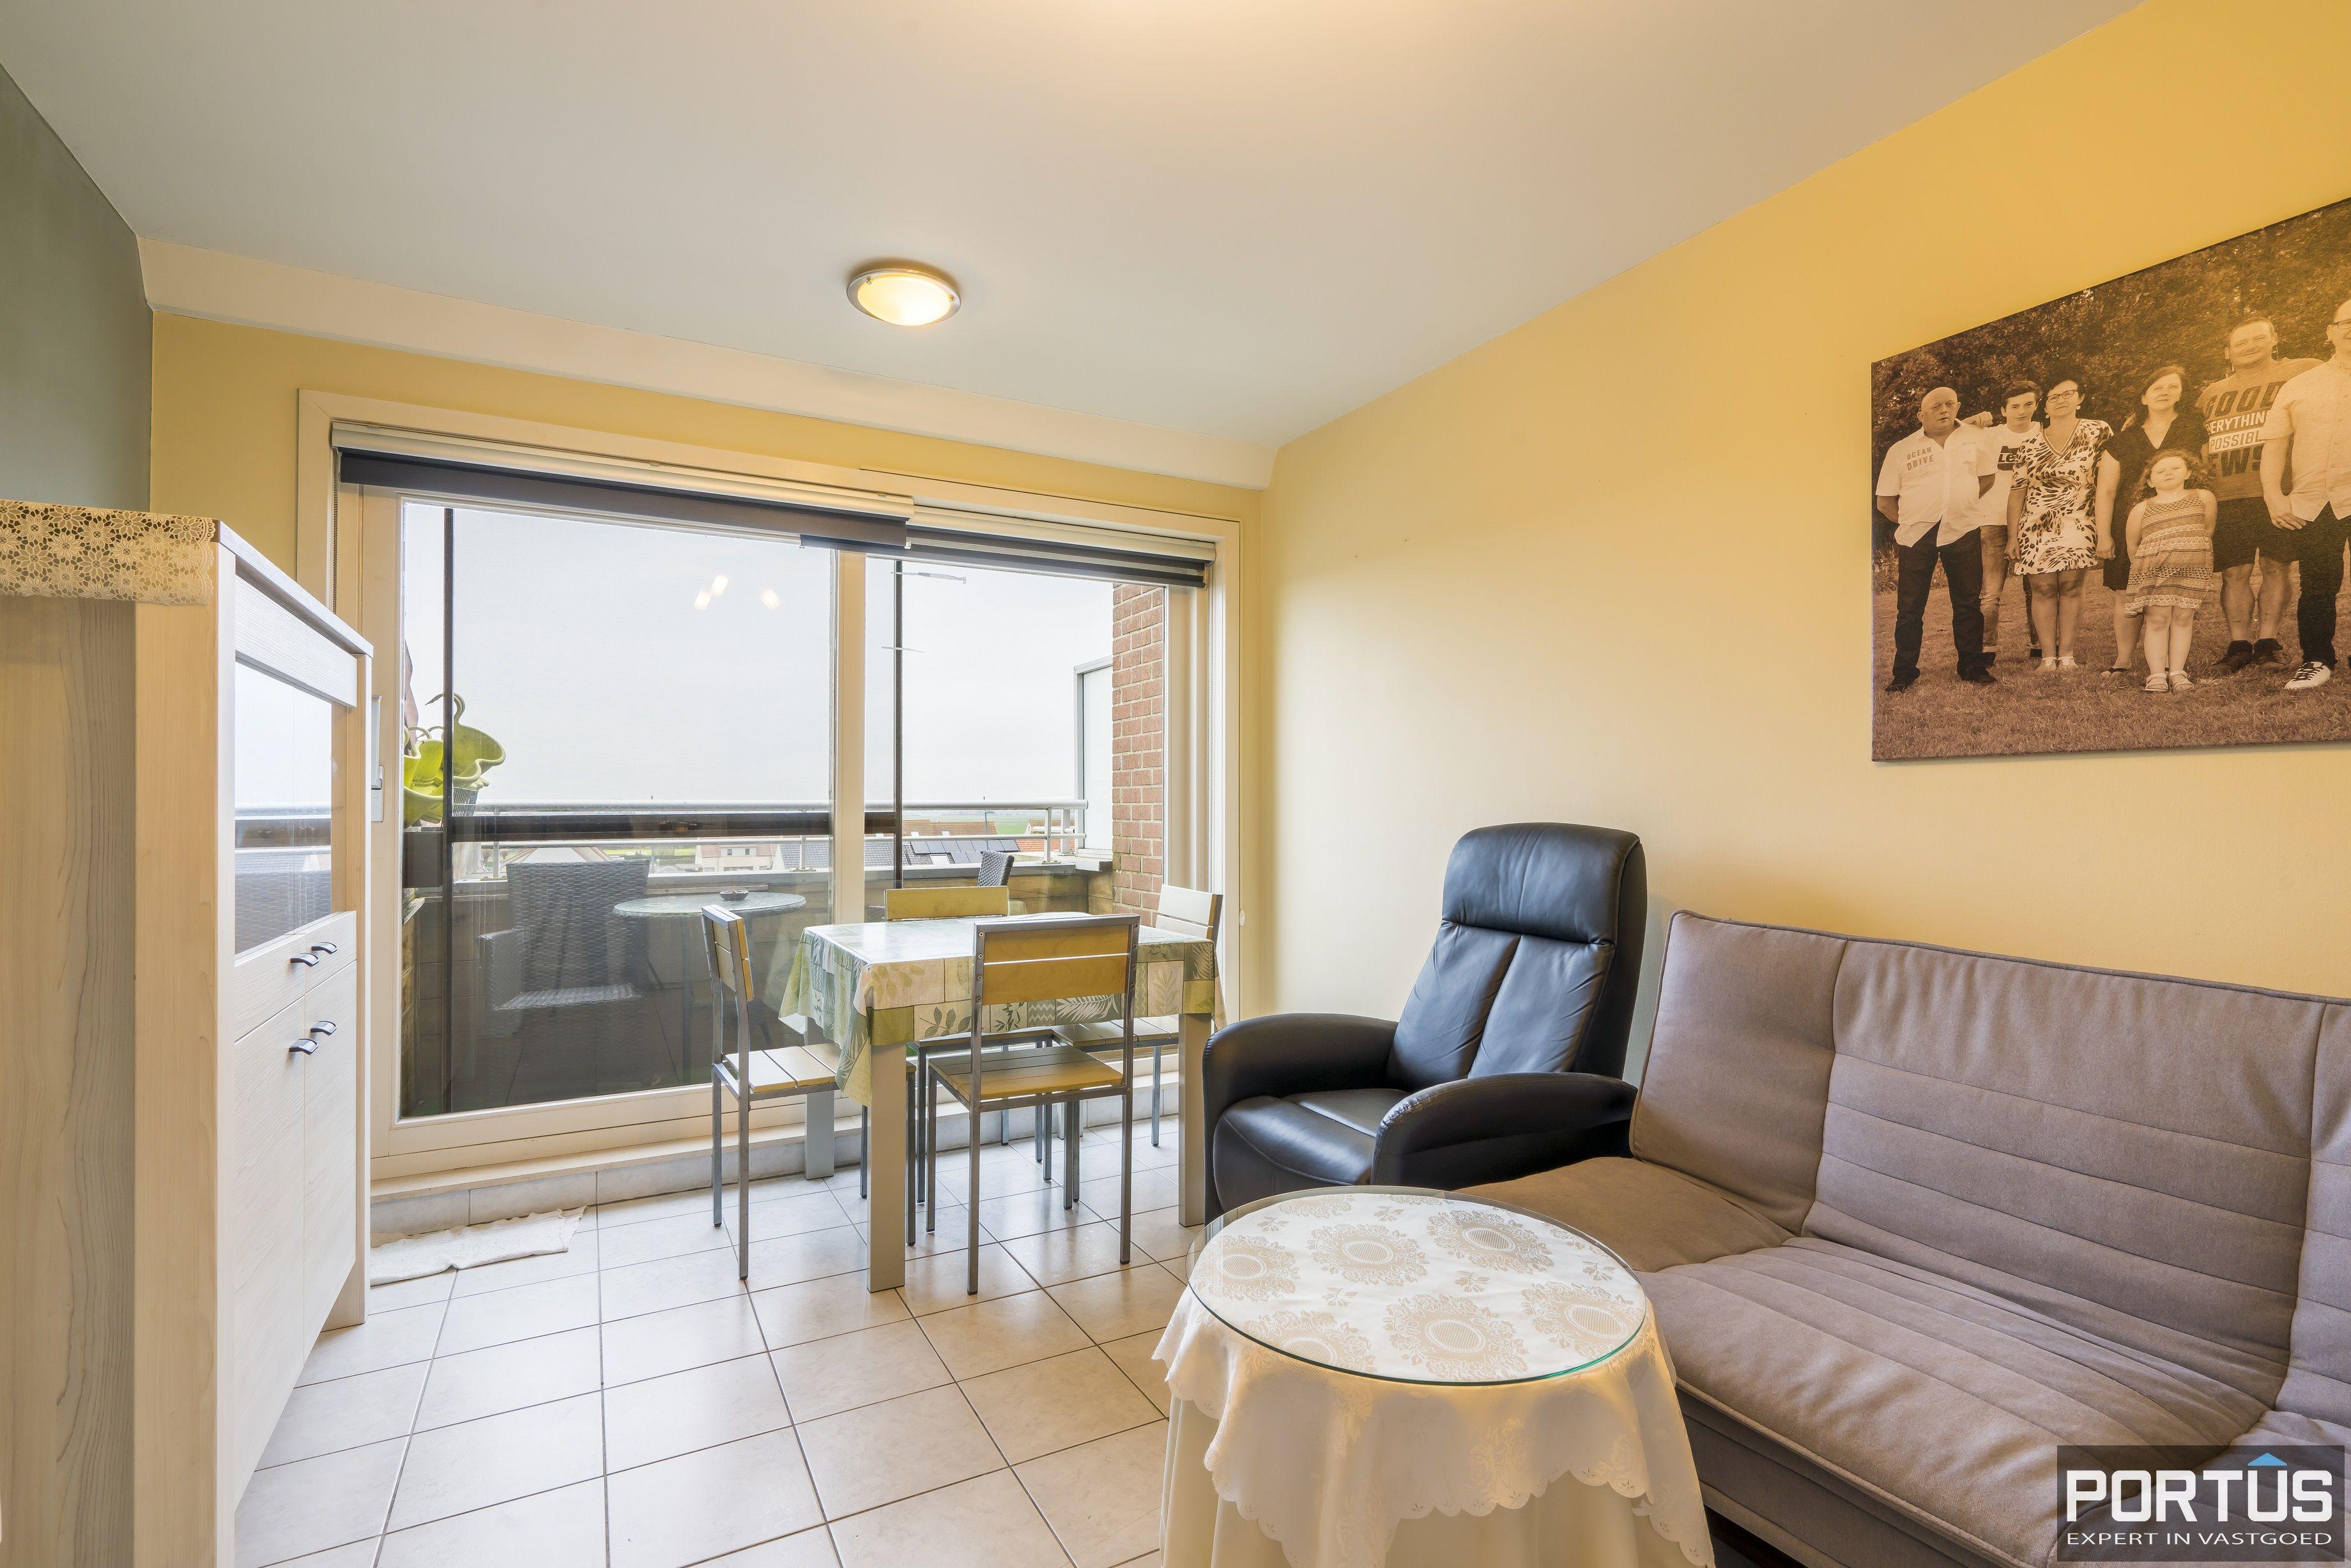 Instapklaar appartement met 1 slaapkamer te koop te Westende - 12055